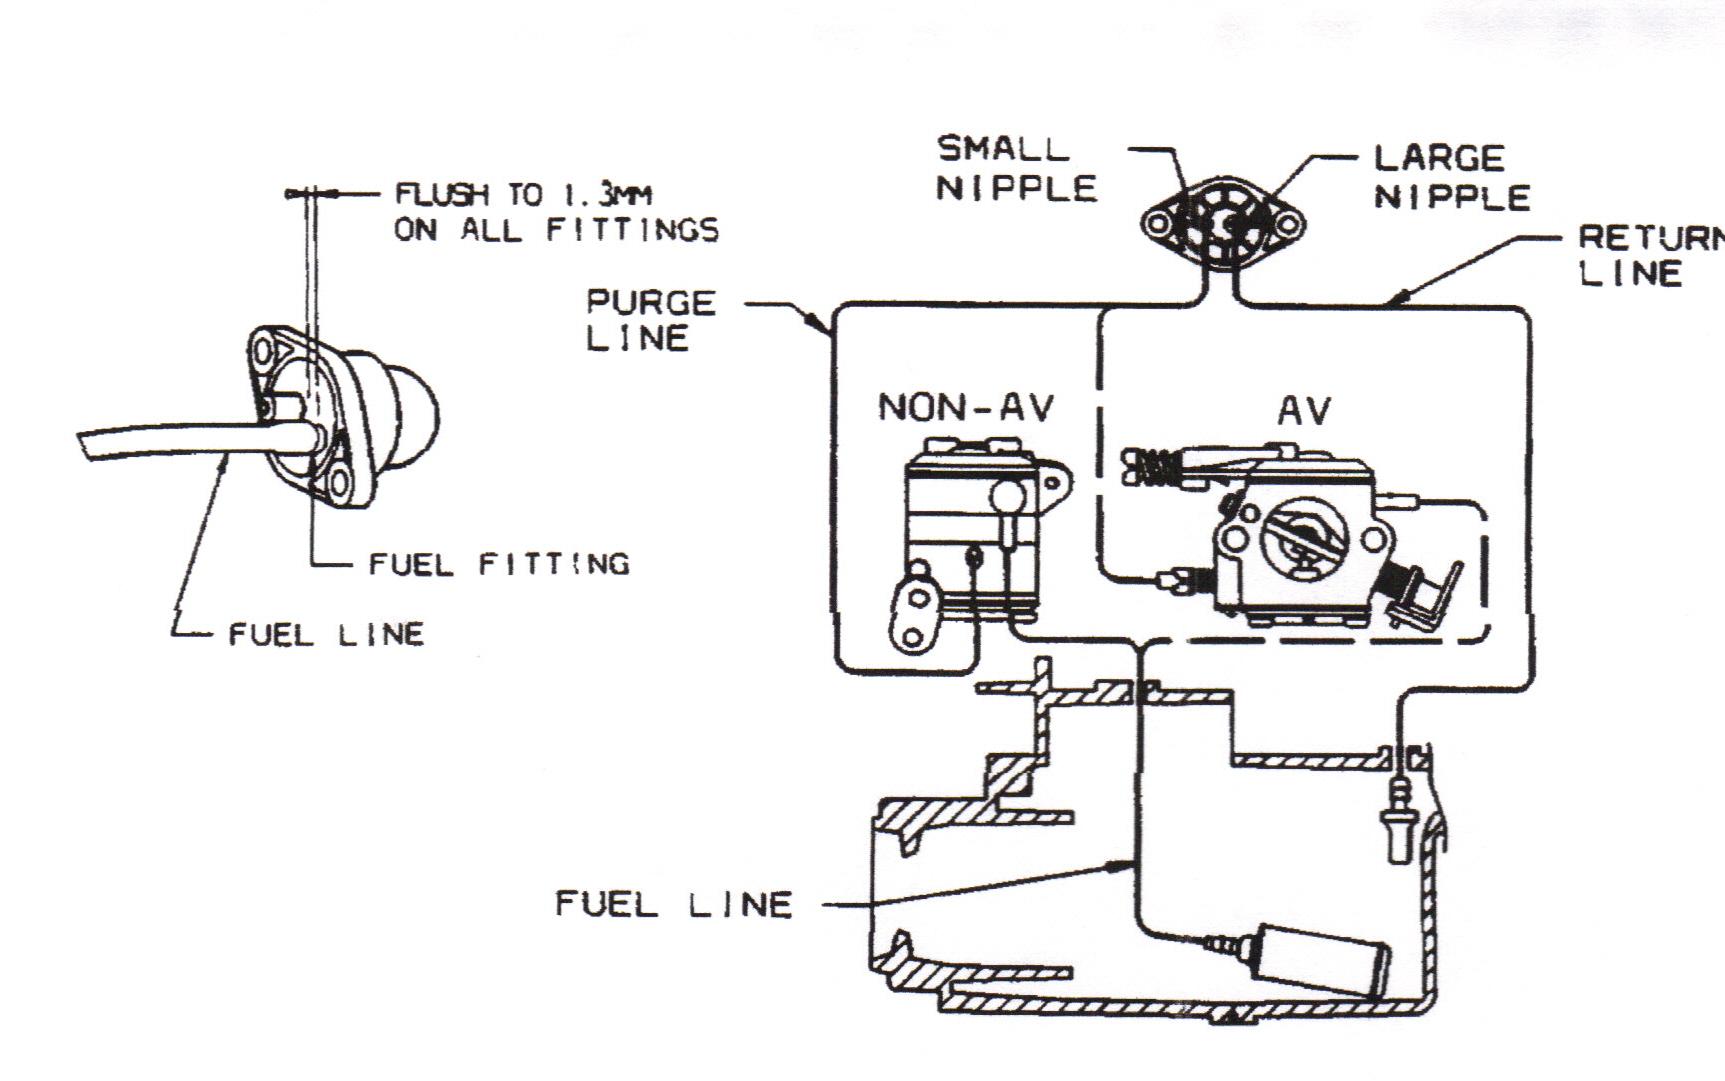 5ce06b09-4bc2-4626-b940-3aeff840bfeb_fuel primer.JPG